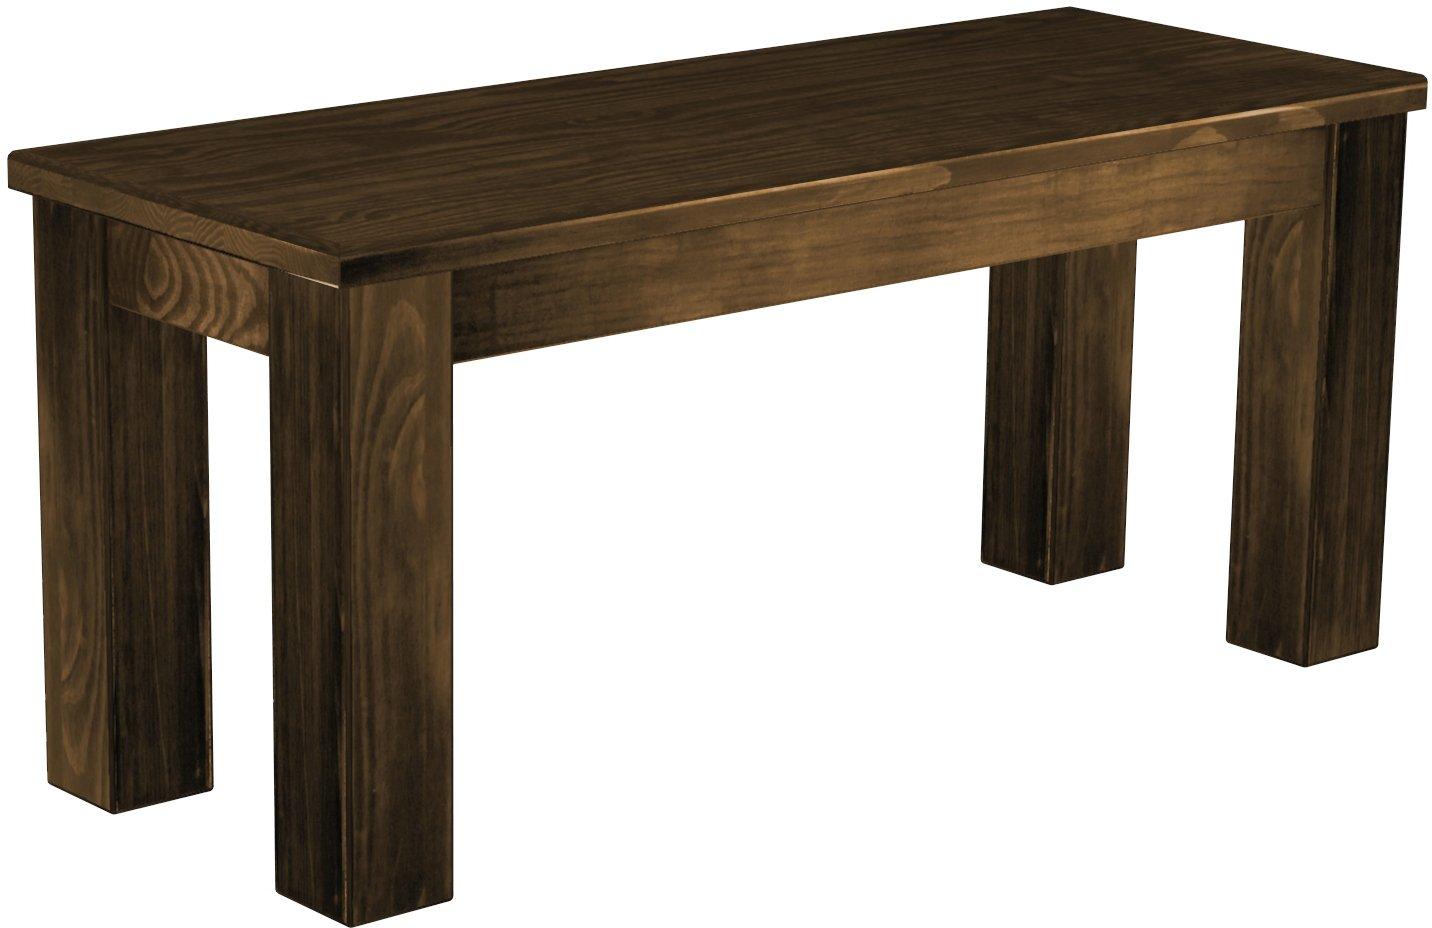 Brasilmöbel Sitzbank & 039;Rio Classico& 039; 100 cm, Pinie Massivholz, Farbton Eiche antik